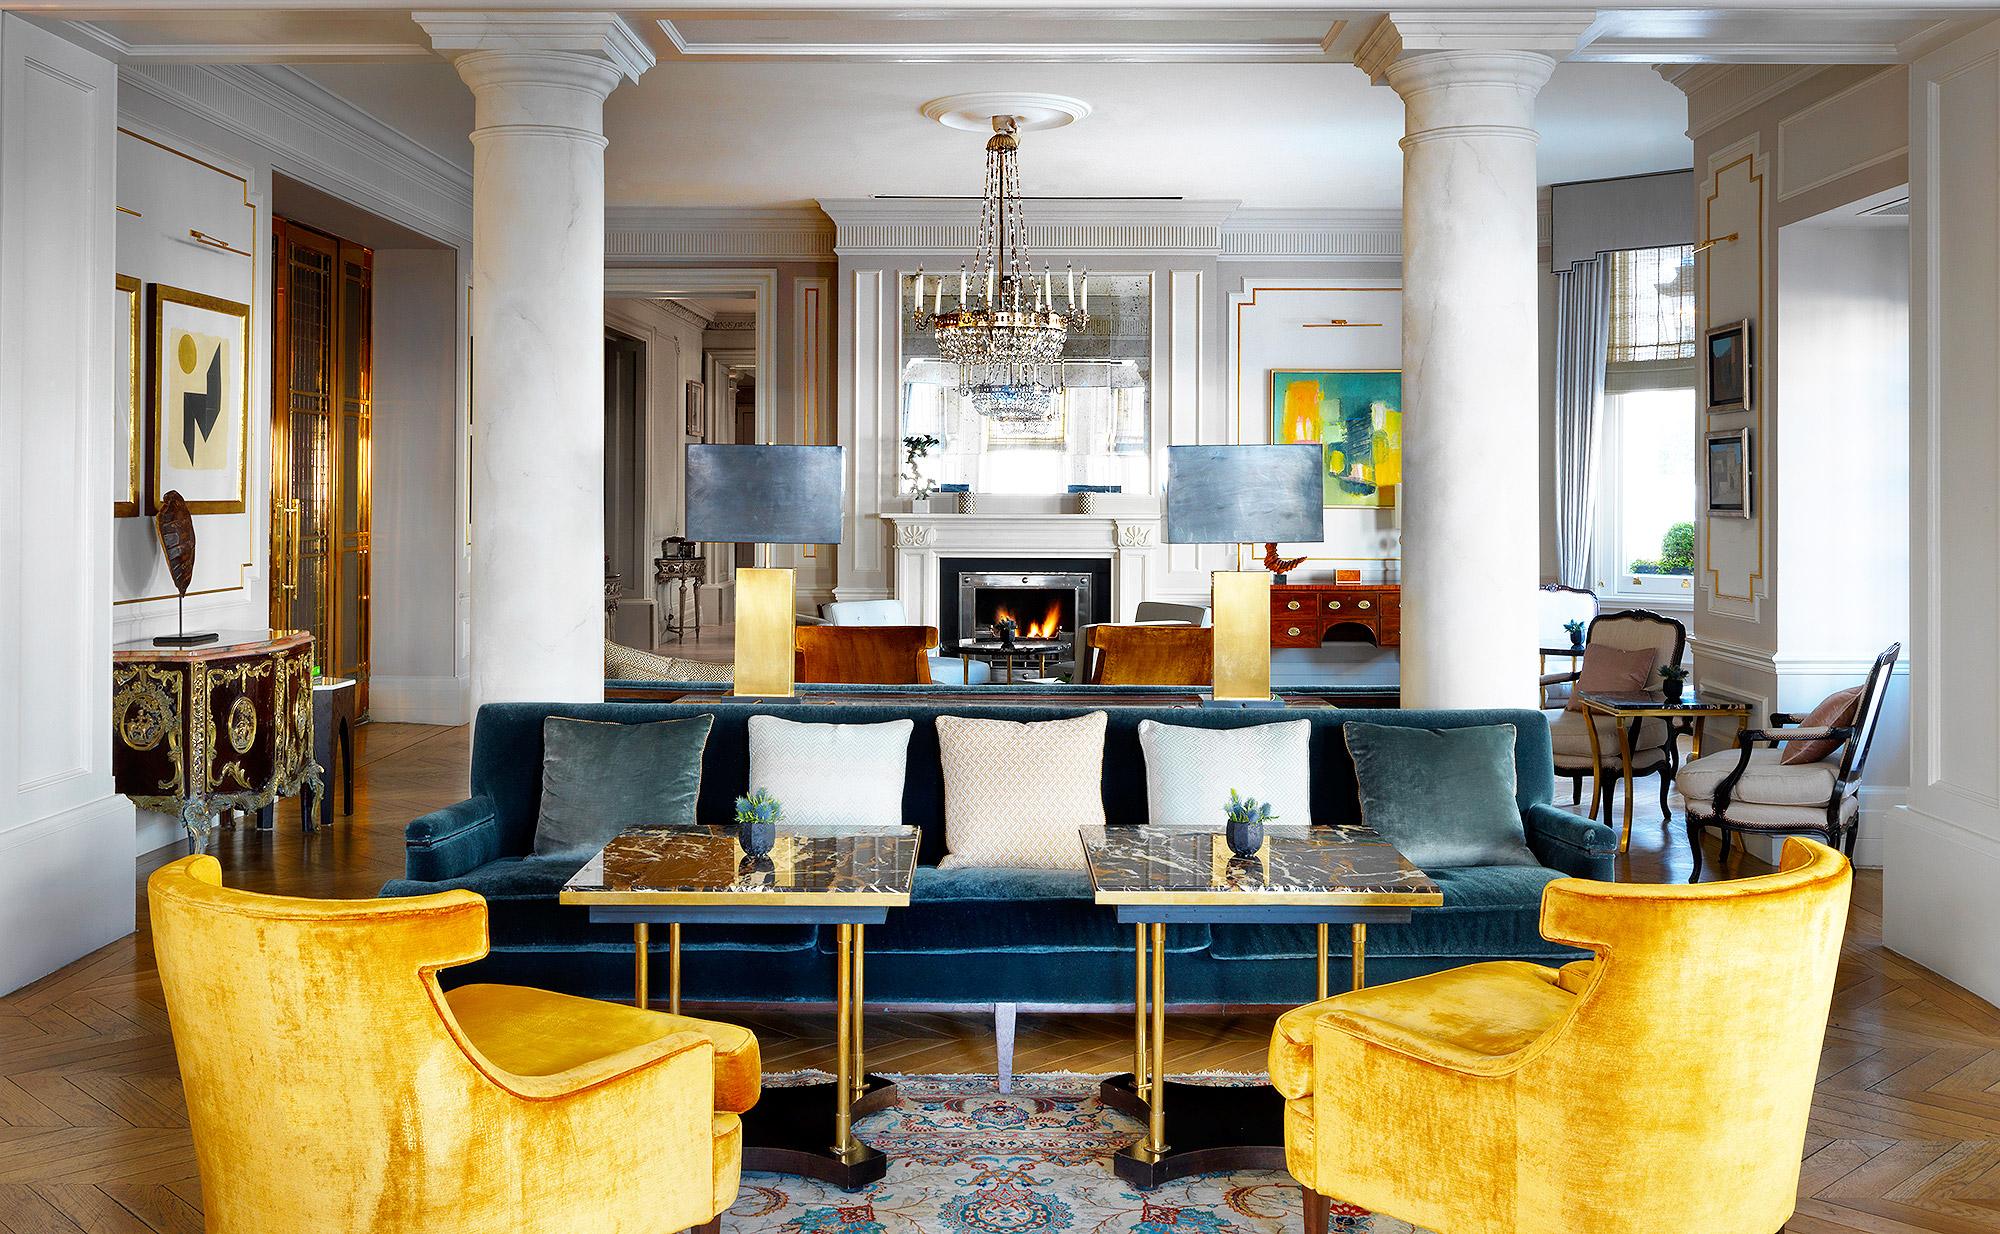 Drawing Room at The Kensington Hotel, London